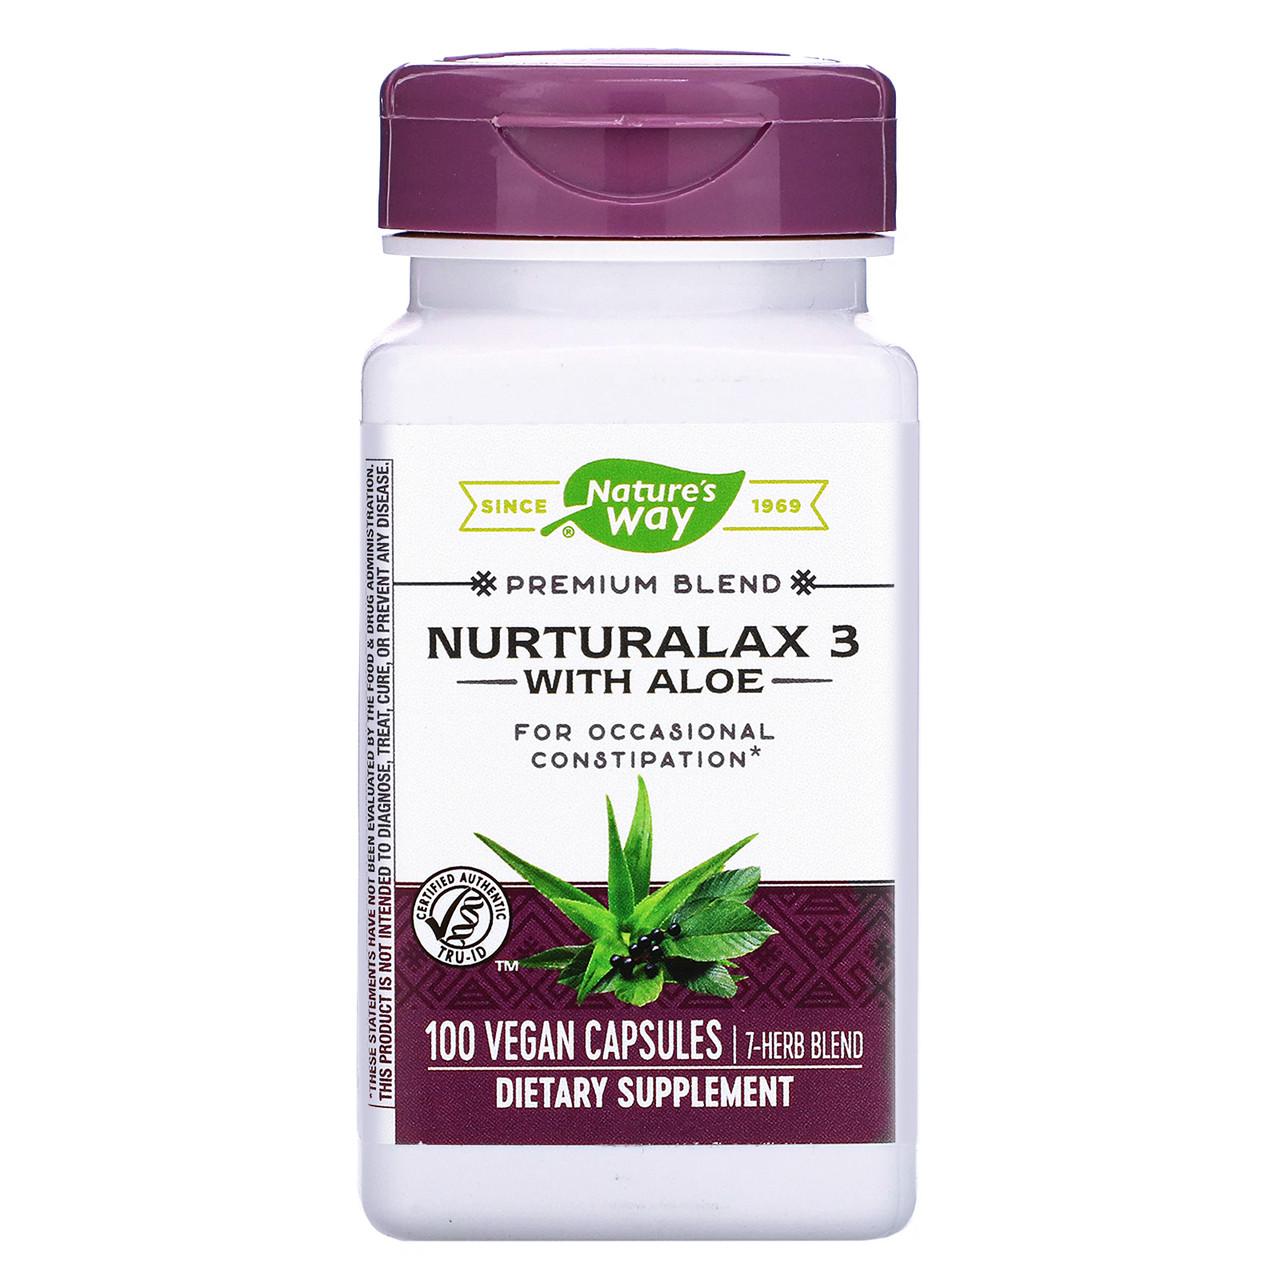 Алоэ вера (Naturalax3), Nature's Way, 430 мг, 100 капсул